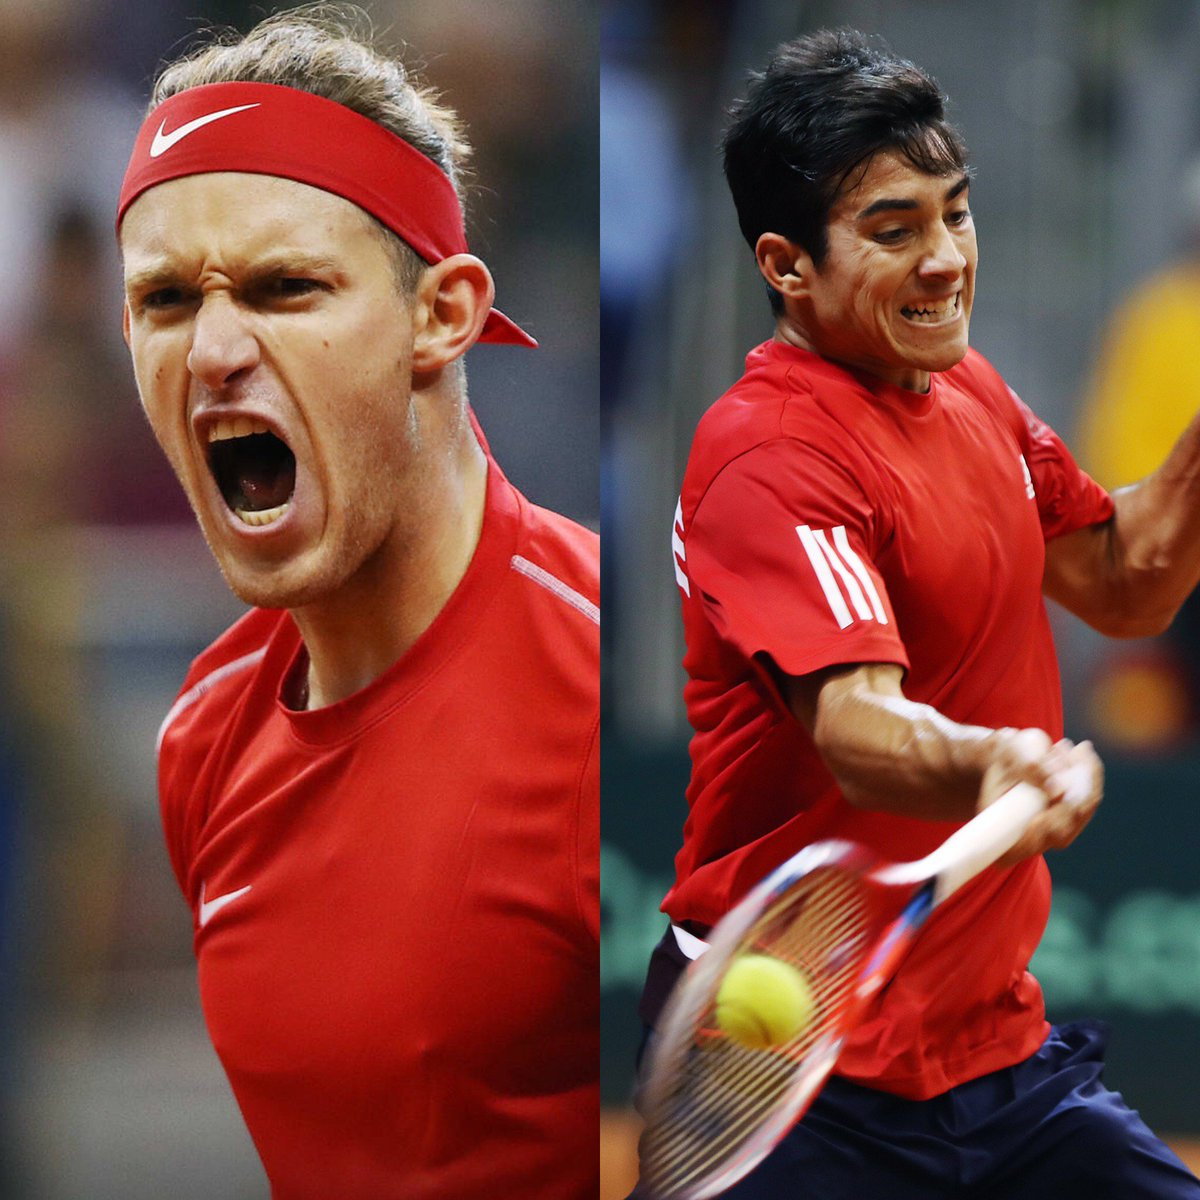 🇨🇱 @NicoJarry | @Garin_Cris  🇨🇱  #Wimbledon doubles ✅ #DavisCupMadridFinals doubles ❓